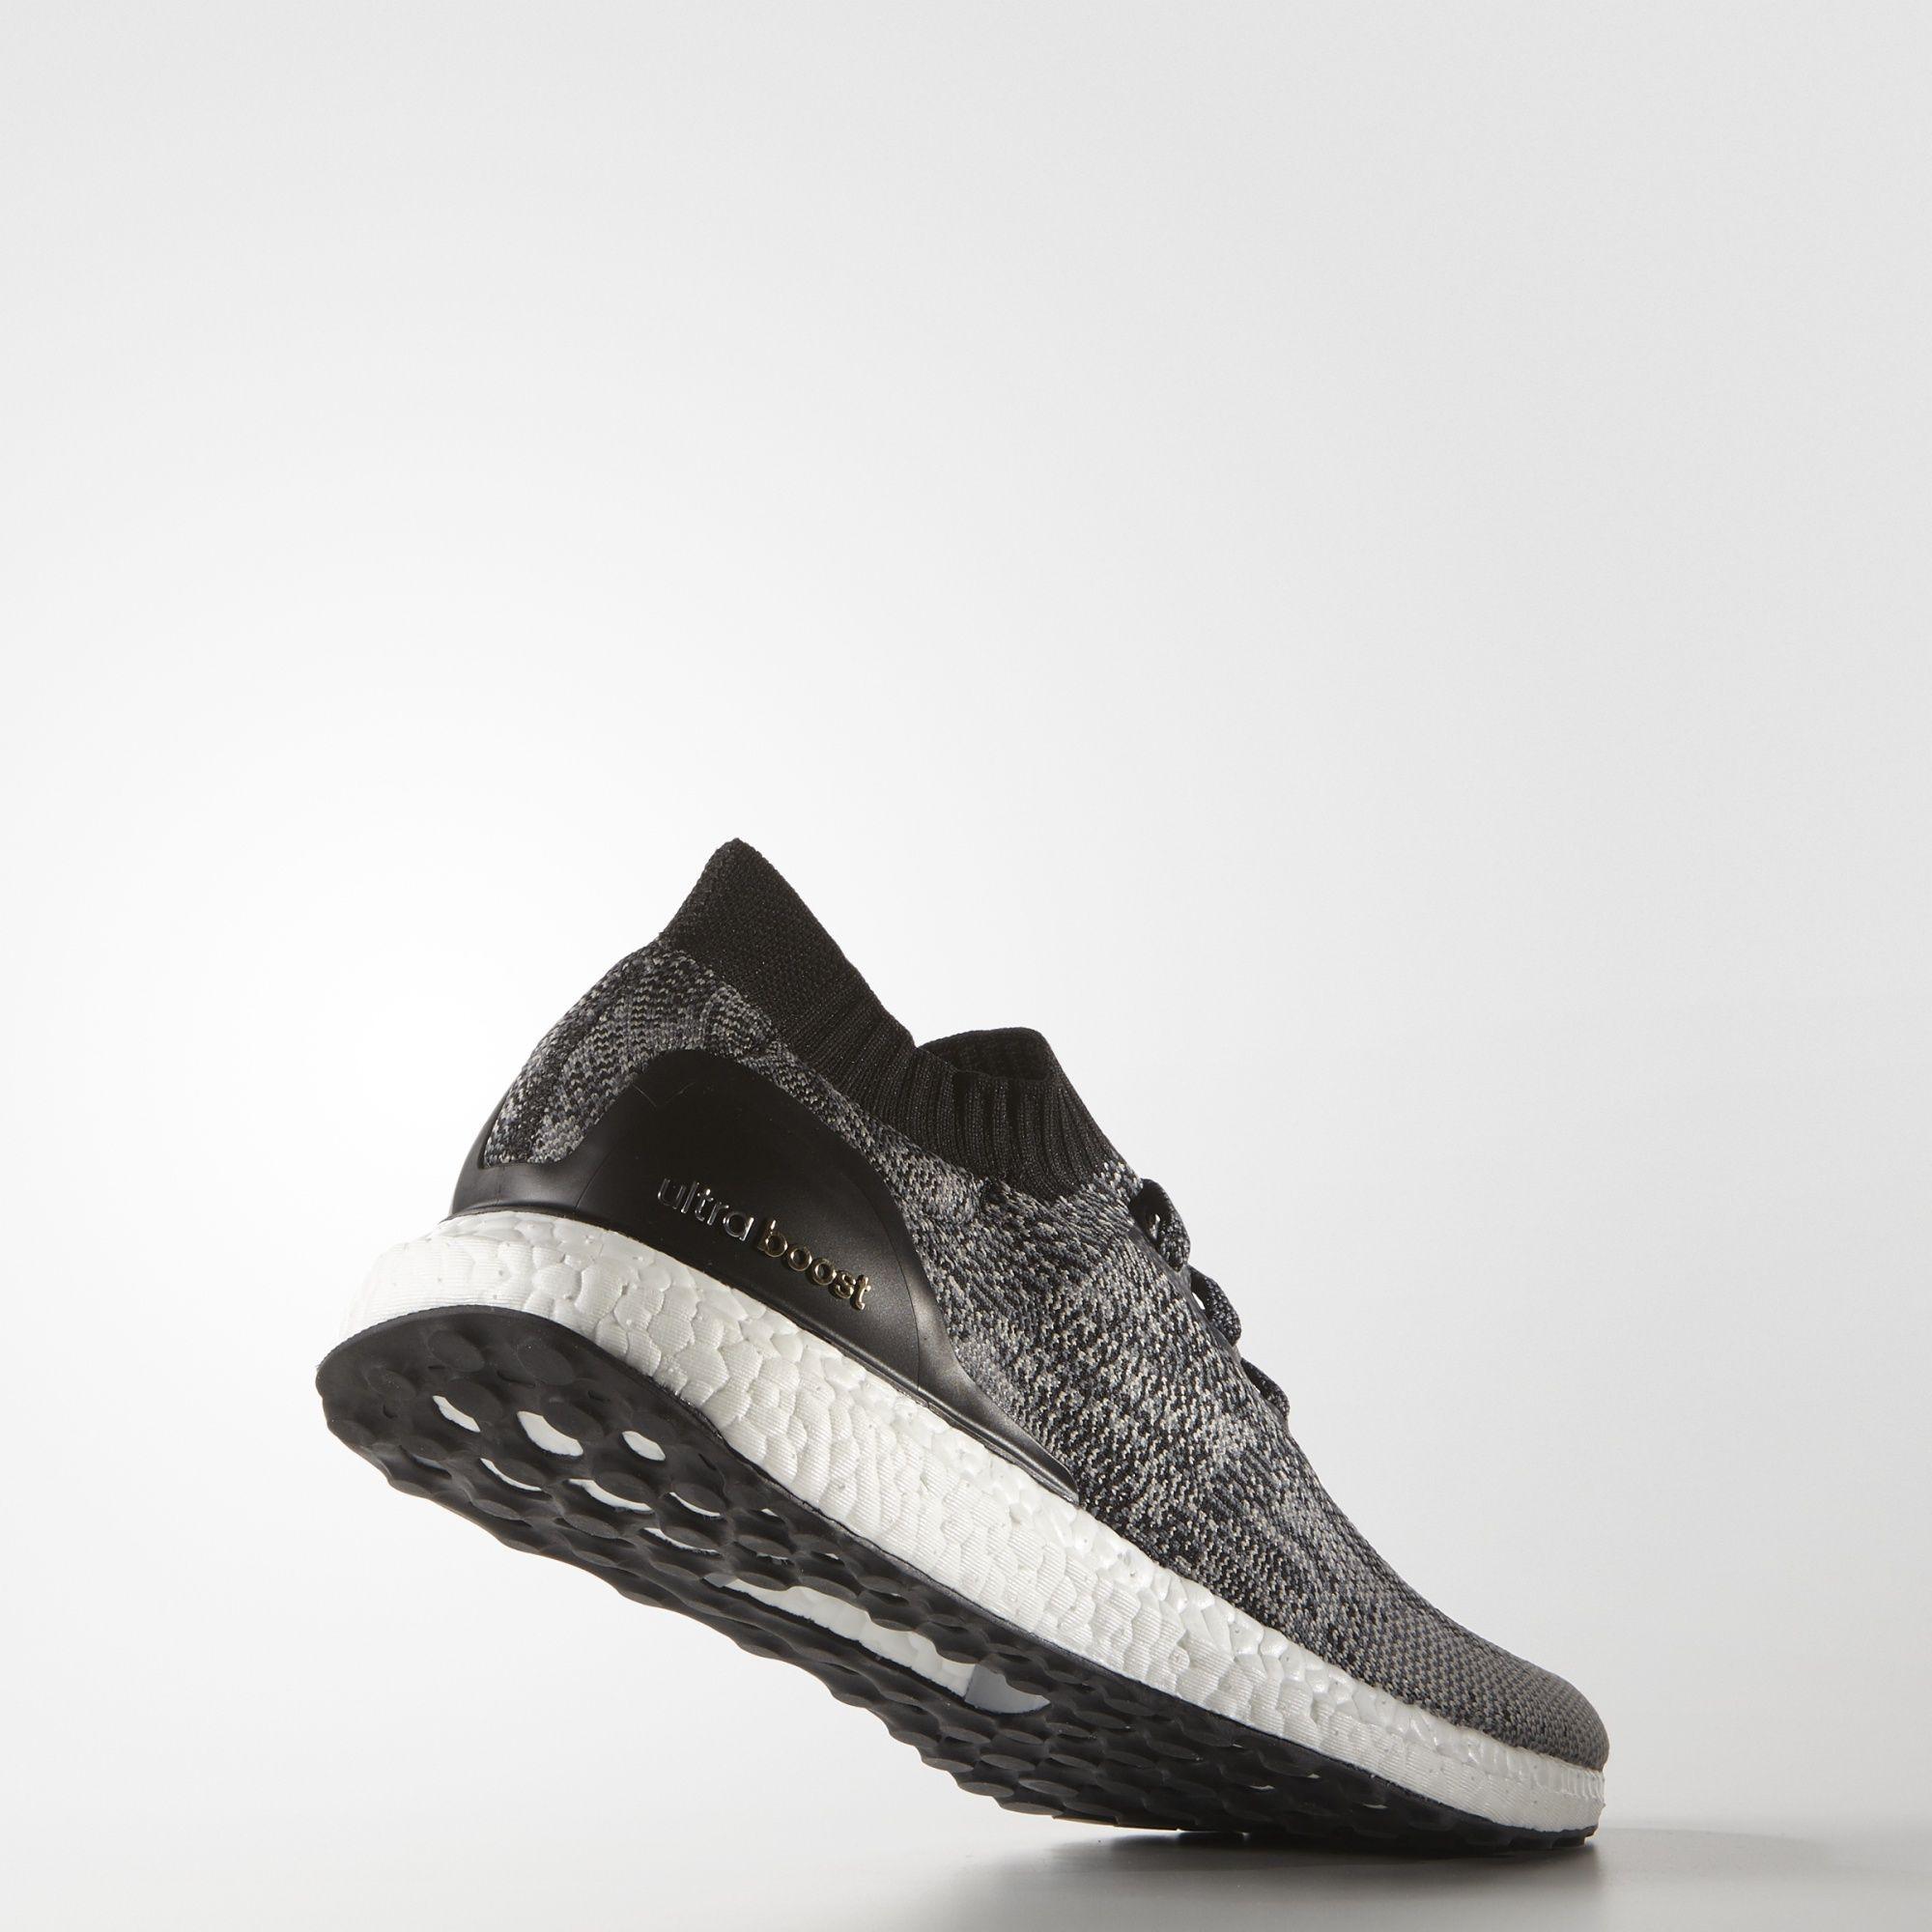 adidas ultra spinta fece uscire le scarpe ultraboost pinterest